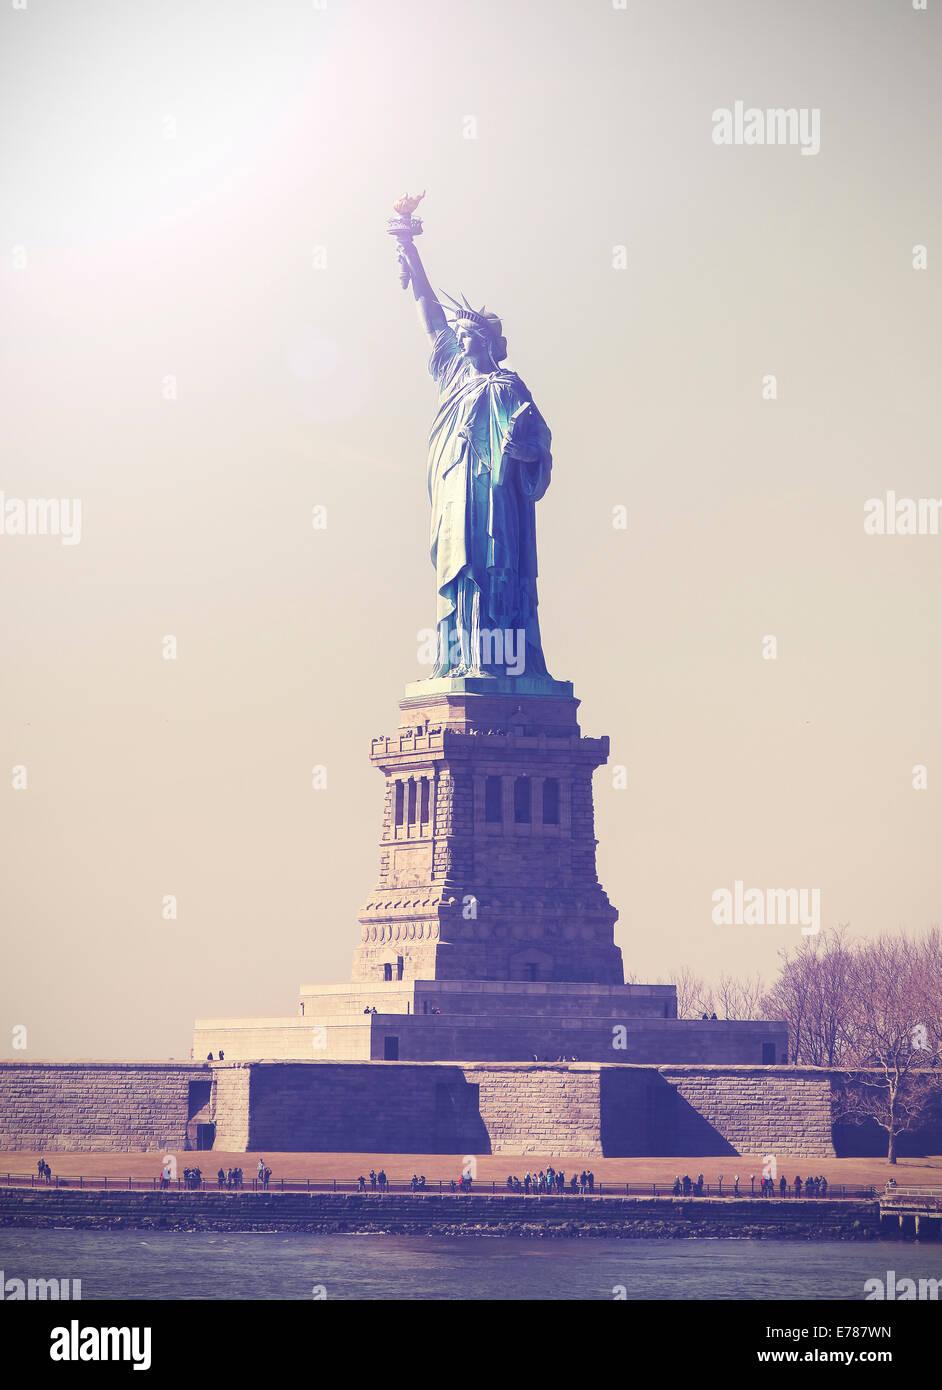 Vintage Bild der Statue of Liberty, NYC, USA. Stockbild